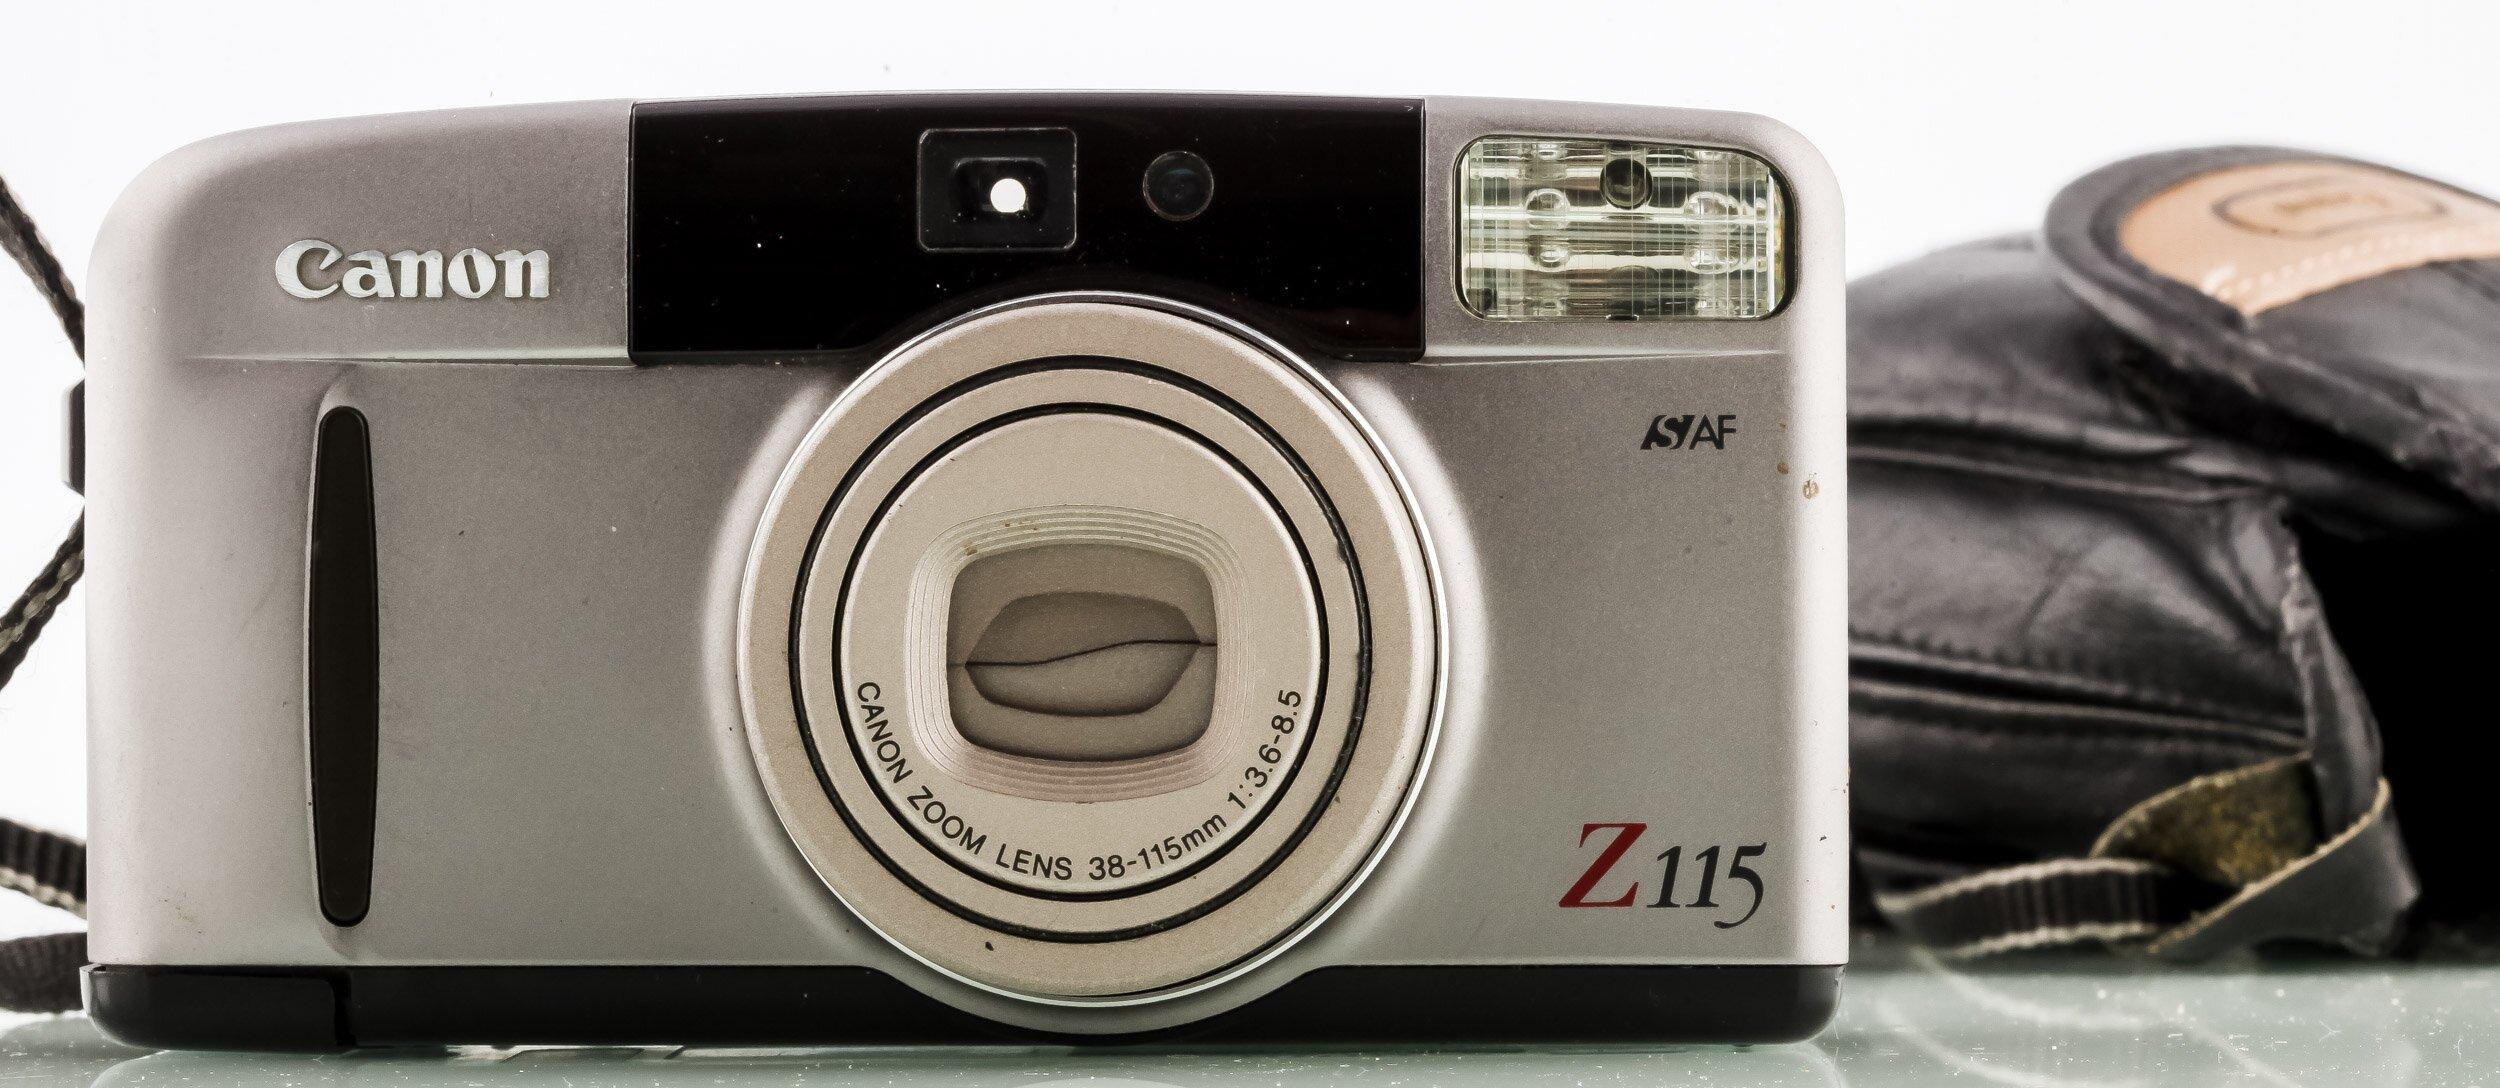 Canon Sure Shot Z115 Analoge Sucherkamera